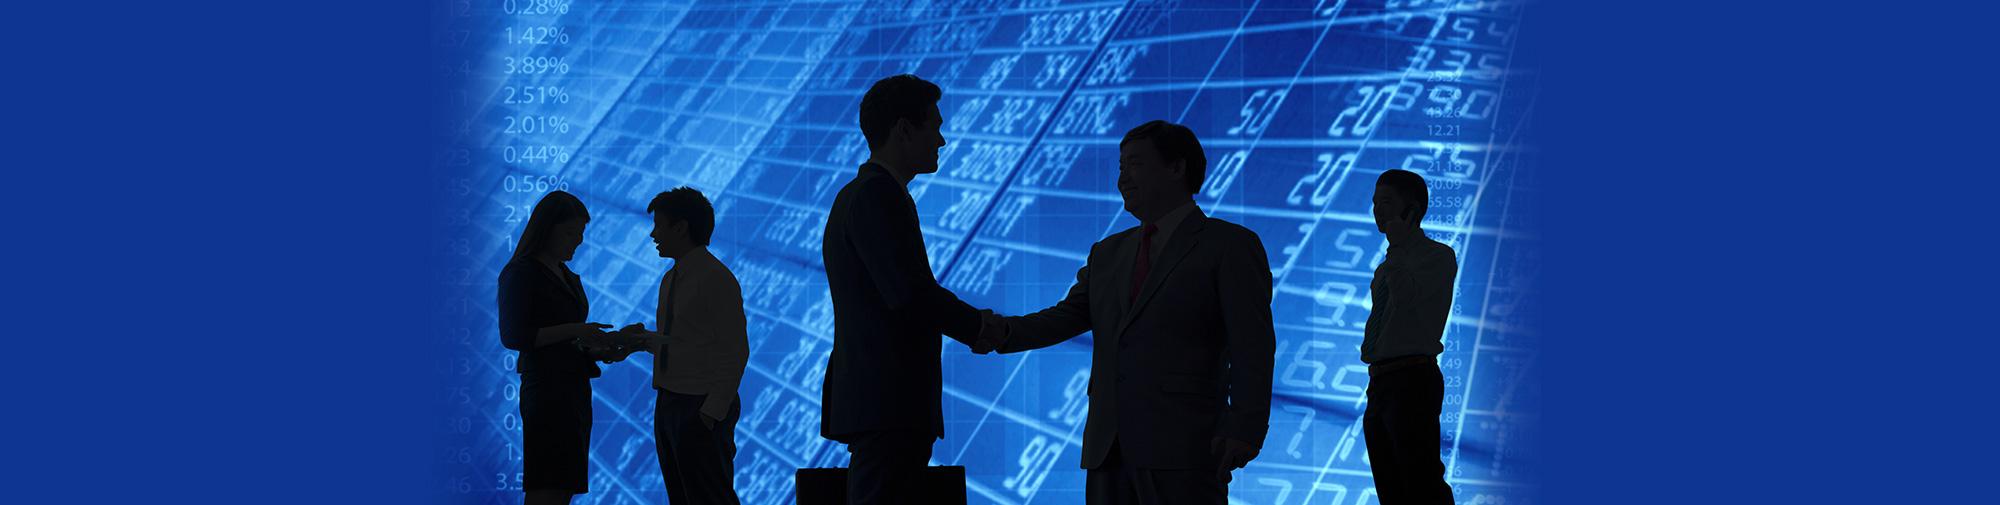 http://www.gekterna.com/userfiles/11e3ebfa-92f9-4083-8c5b-a26d00fe9b3c/Investor_Relations2.jpg